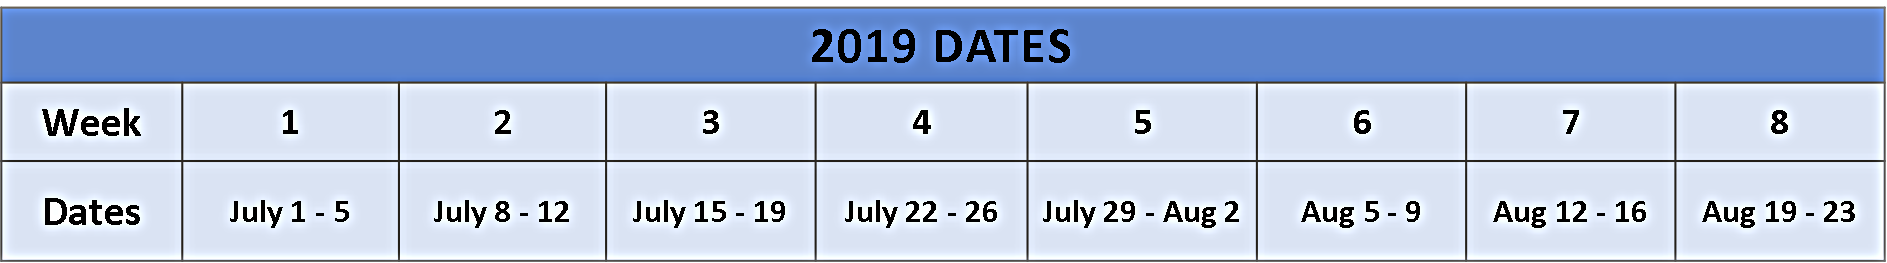 2019 Katonim Dates